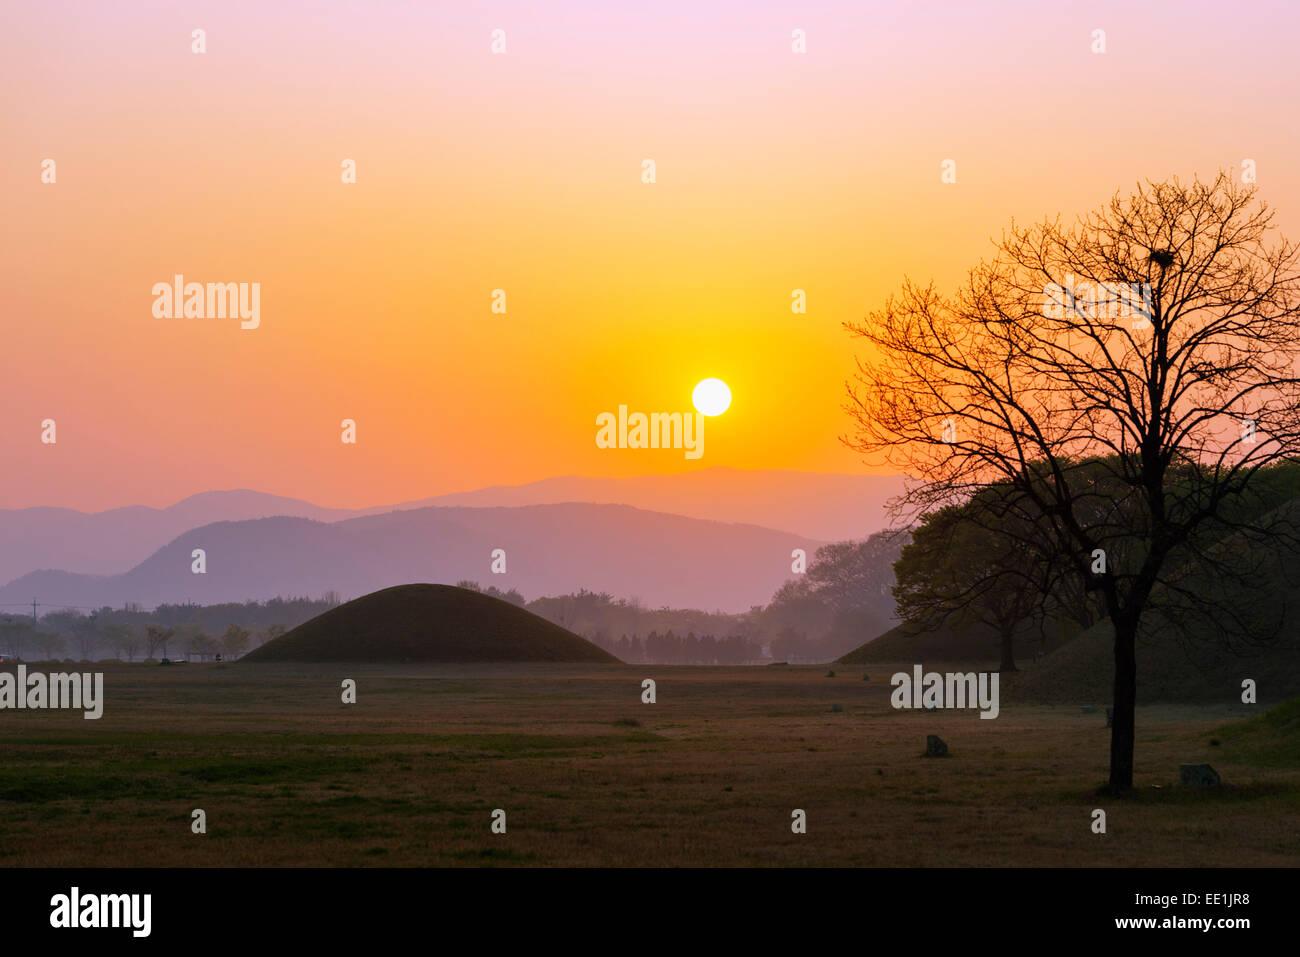 Royal Tombs burial mounds at sunrise, UNESCO World Heritage Site, Gyeongju, Gyeongsangbuk-do, South Korea, Asia - Stock Image